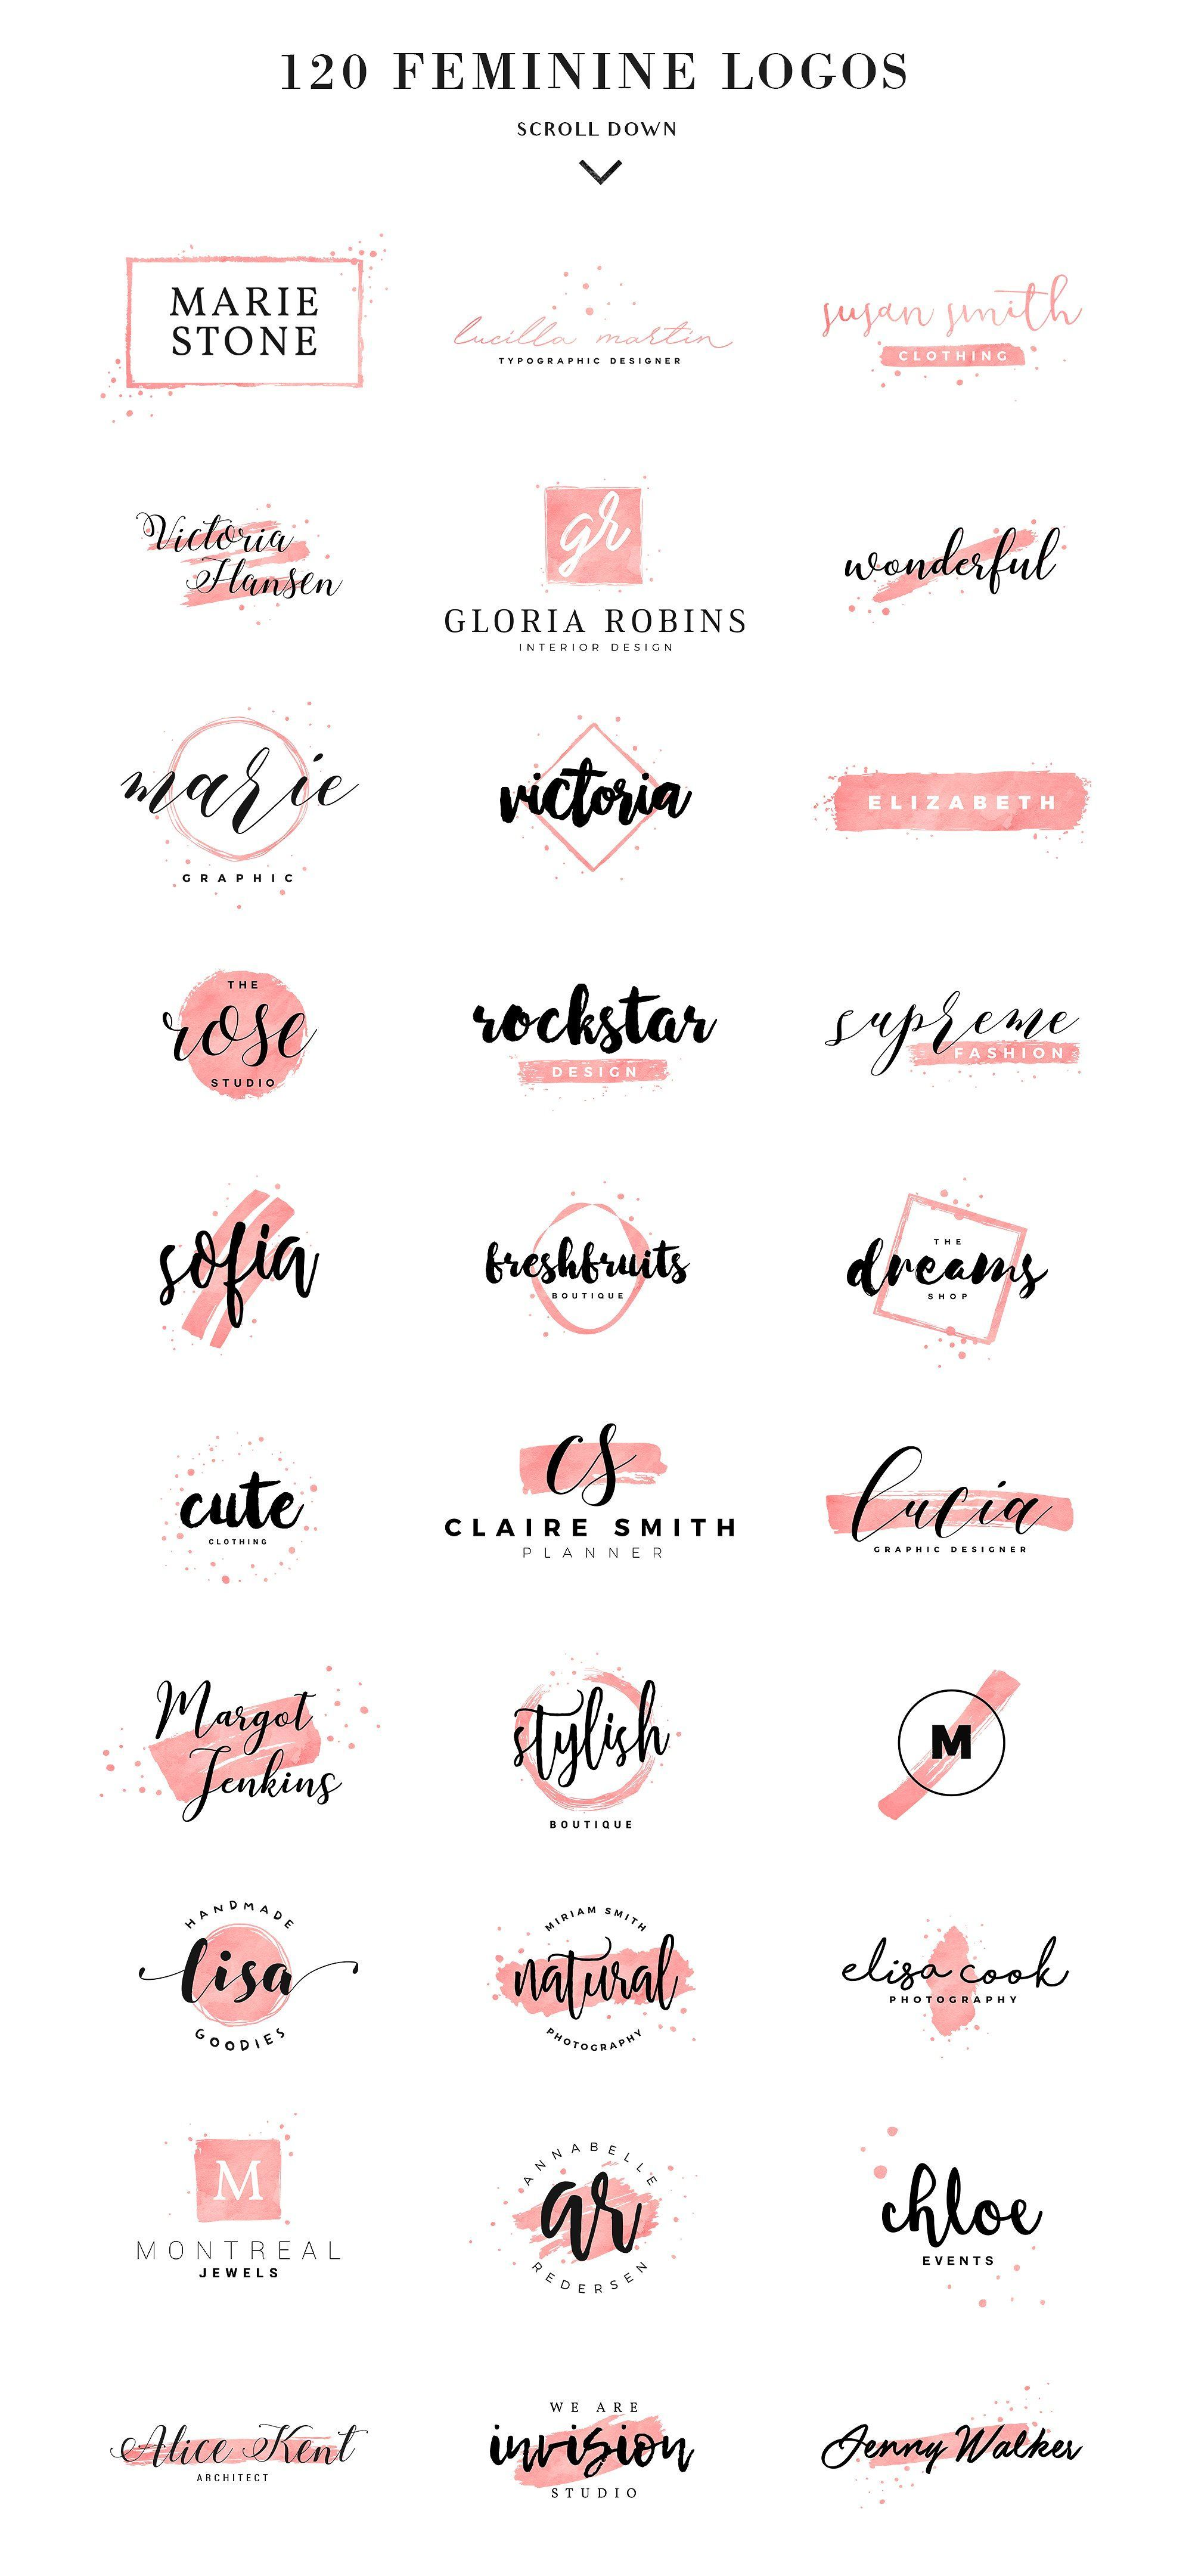 120 Feminine Branding Logos Desain Logo Bisnis Kartu Nama Huruf